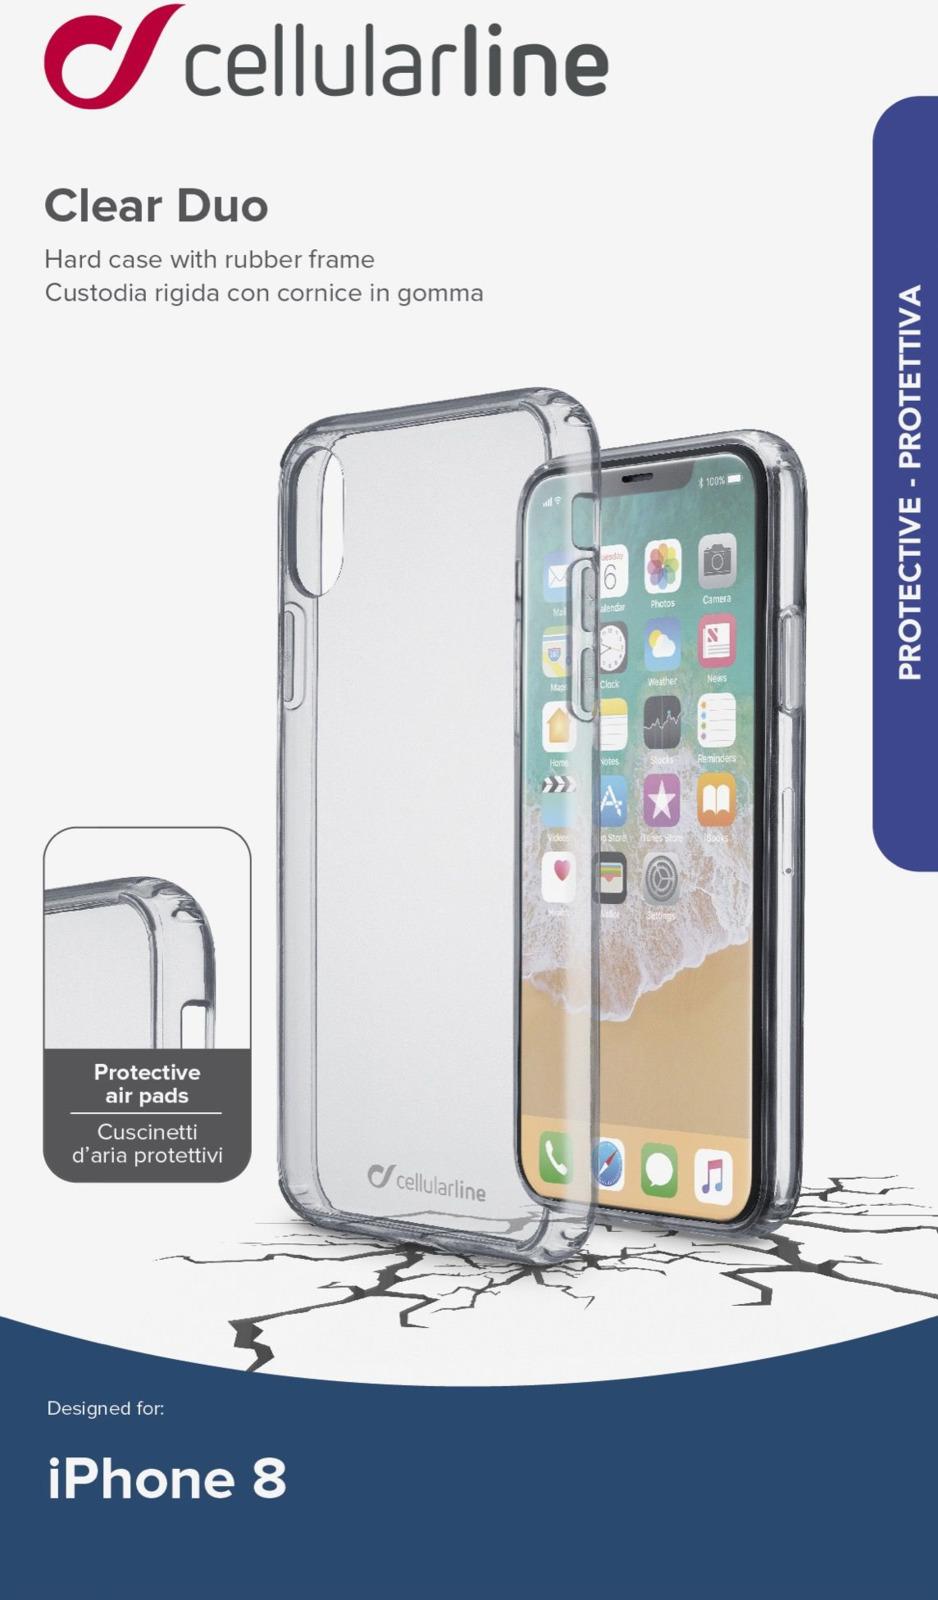 Чехол Cellularline для Apple iPhone X, CLEARDUOIPH8T, прозрачный